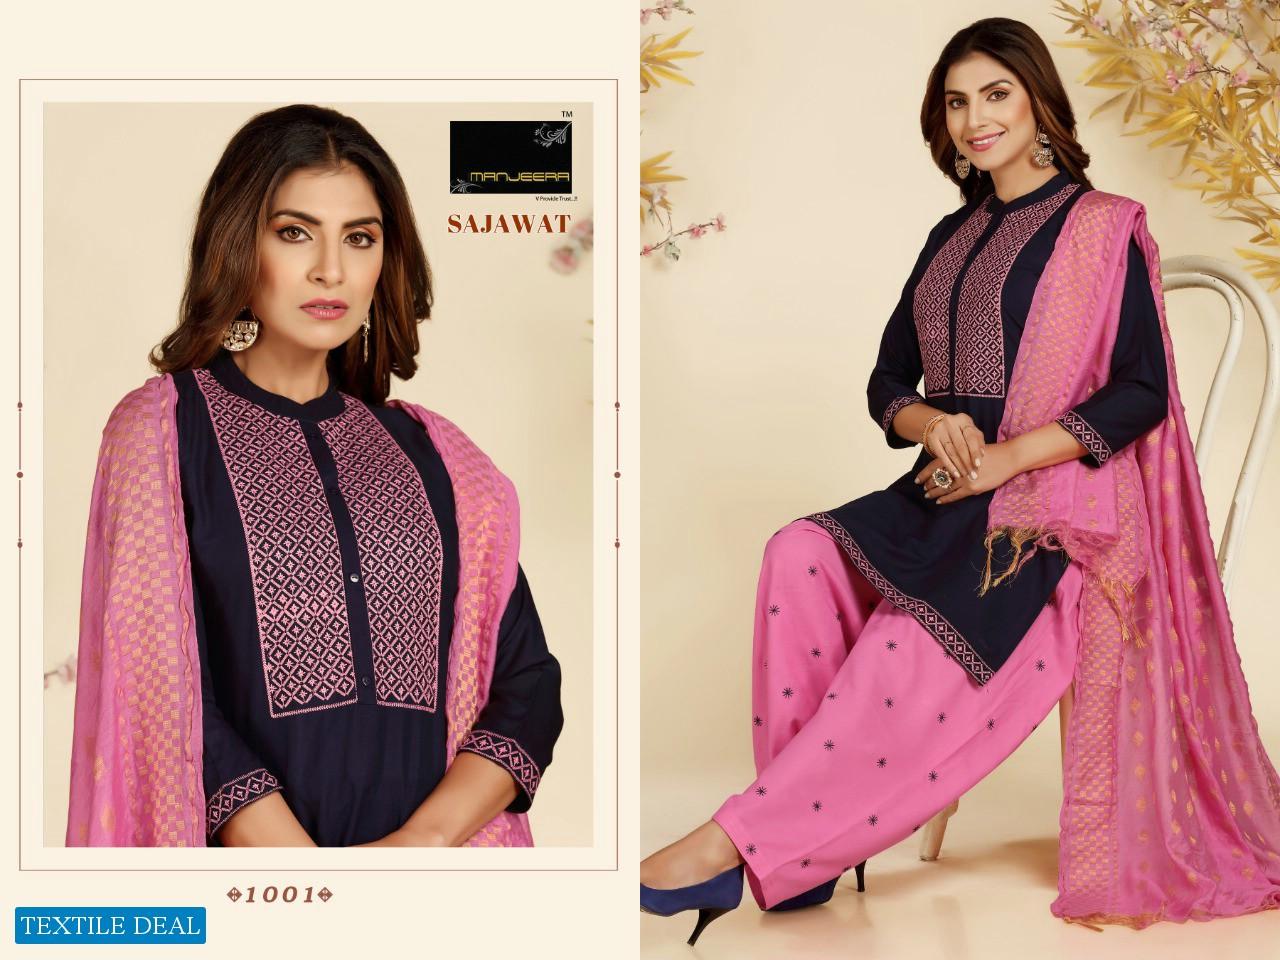 Manjeera Sajawat Wholesale Full Stitched Top And Bottom And Dupatta